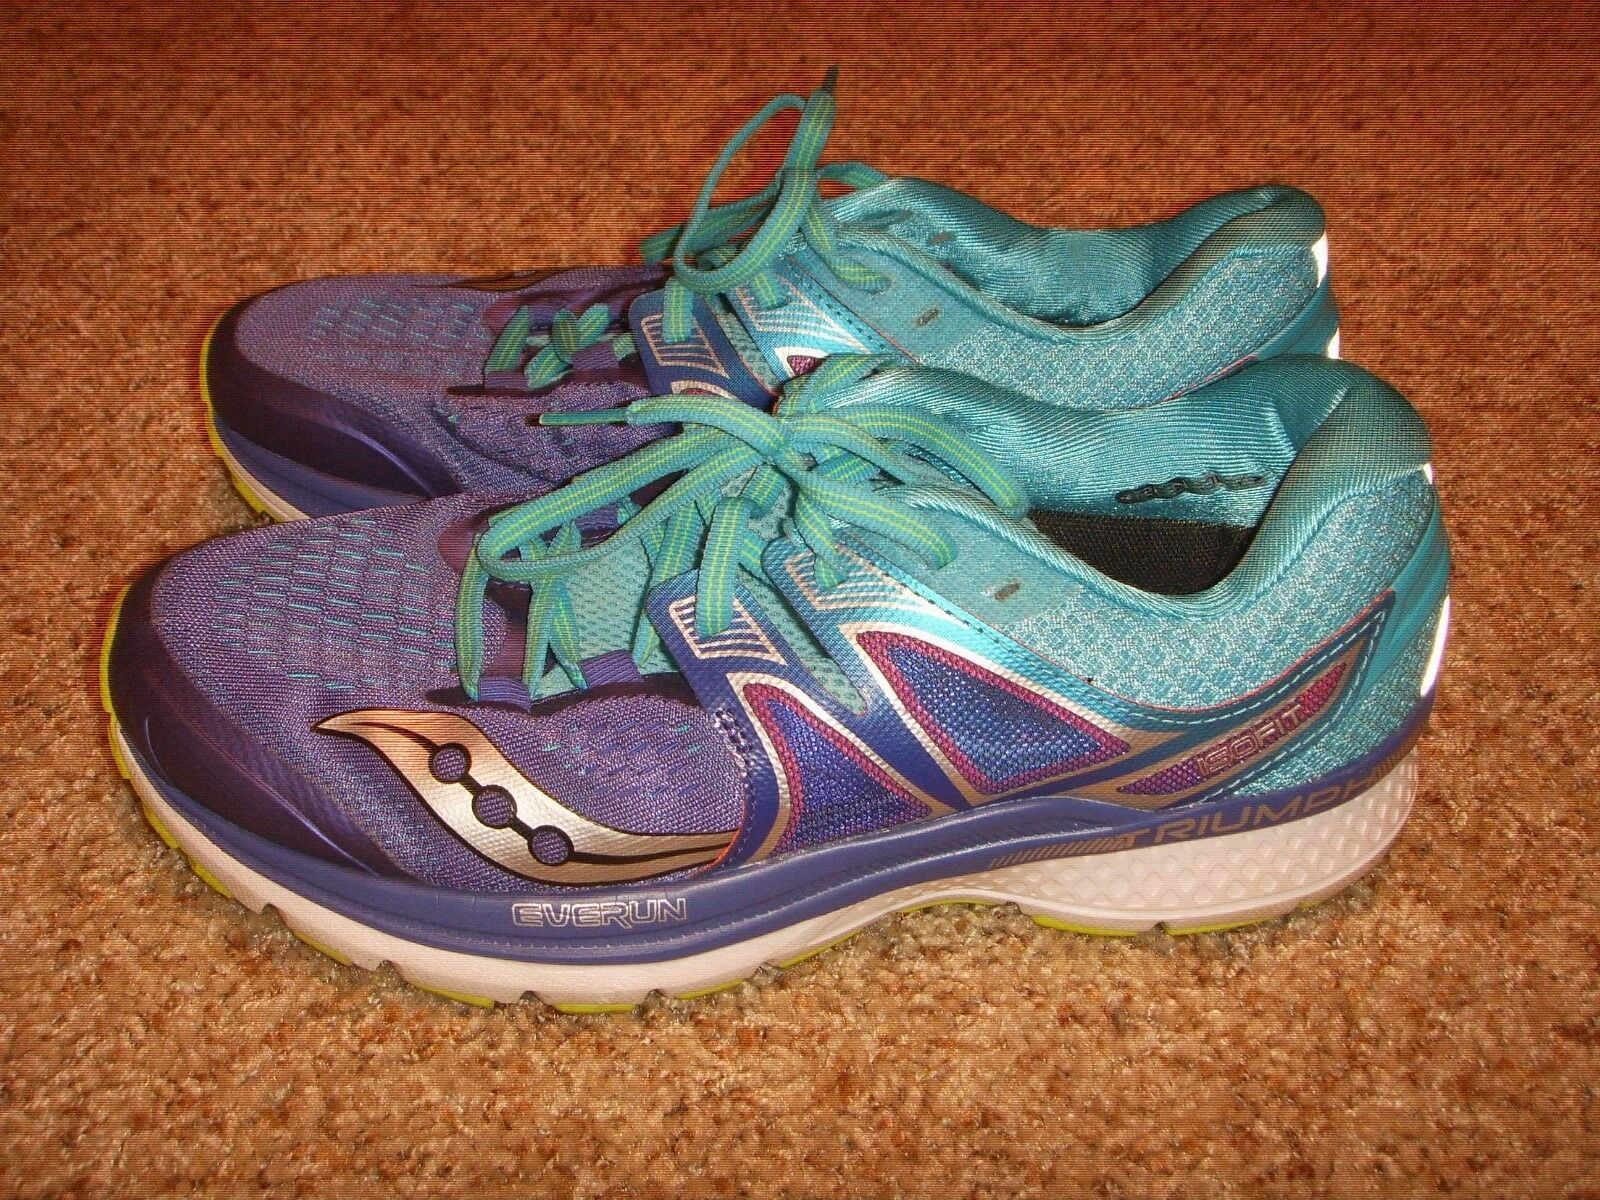 Saucony S10347-1 Triumph ISOfit Purple Running shoes Womens Size 9